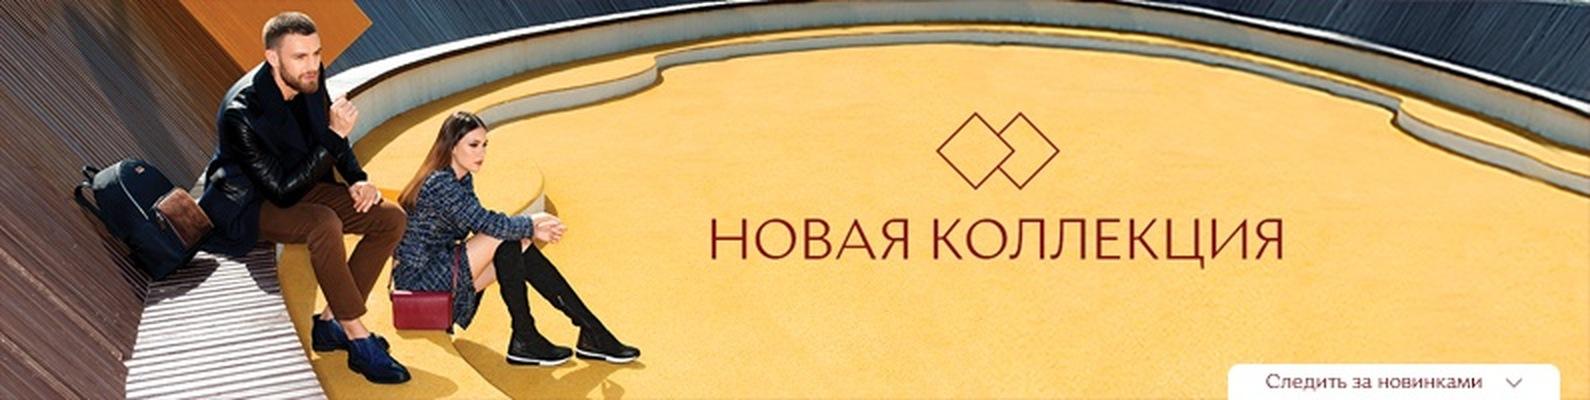 Mascotte - официальная страница бренда   ВКонтакте 86ac647ddef